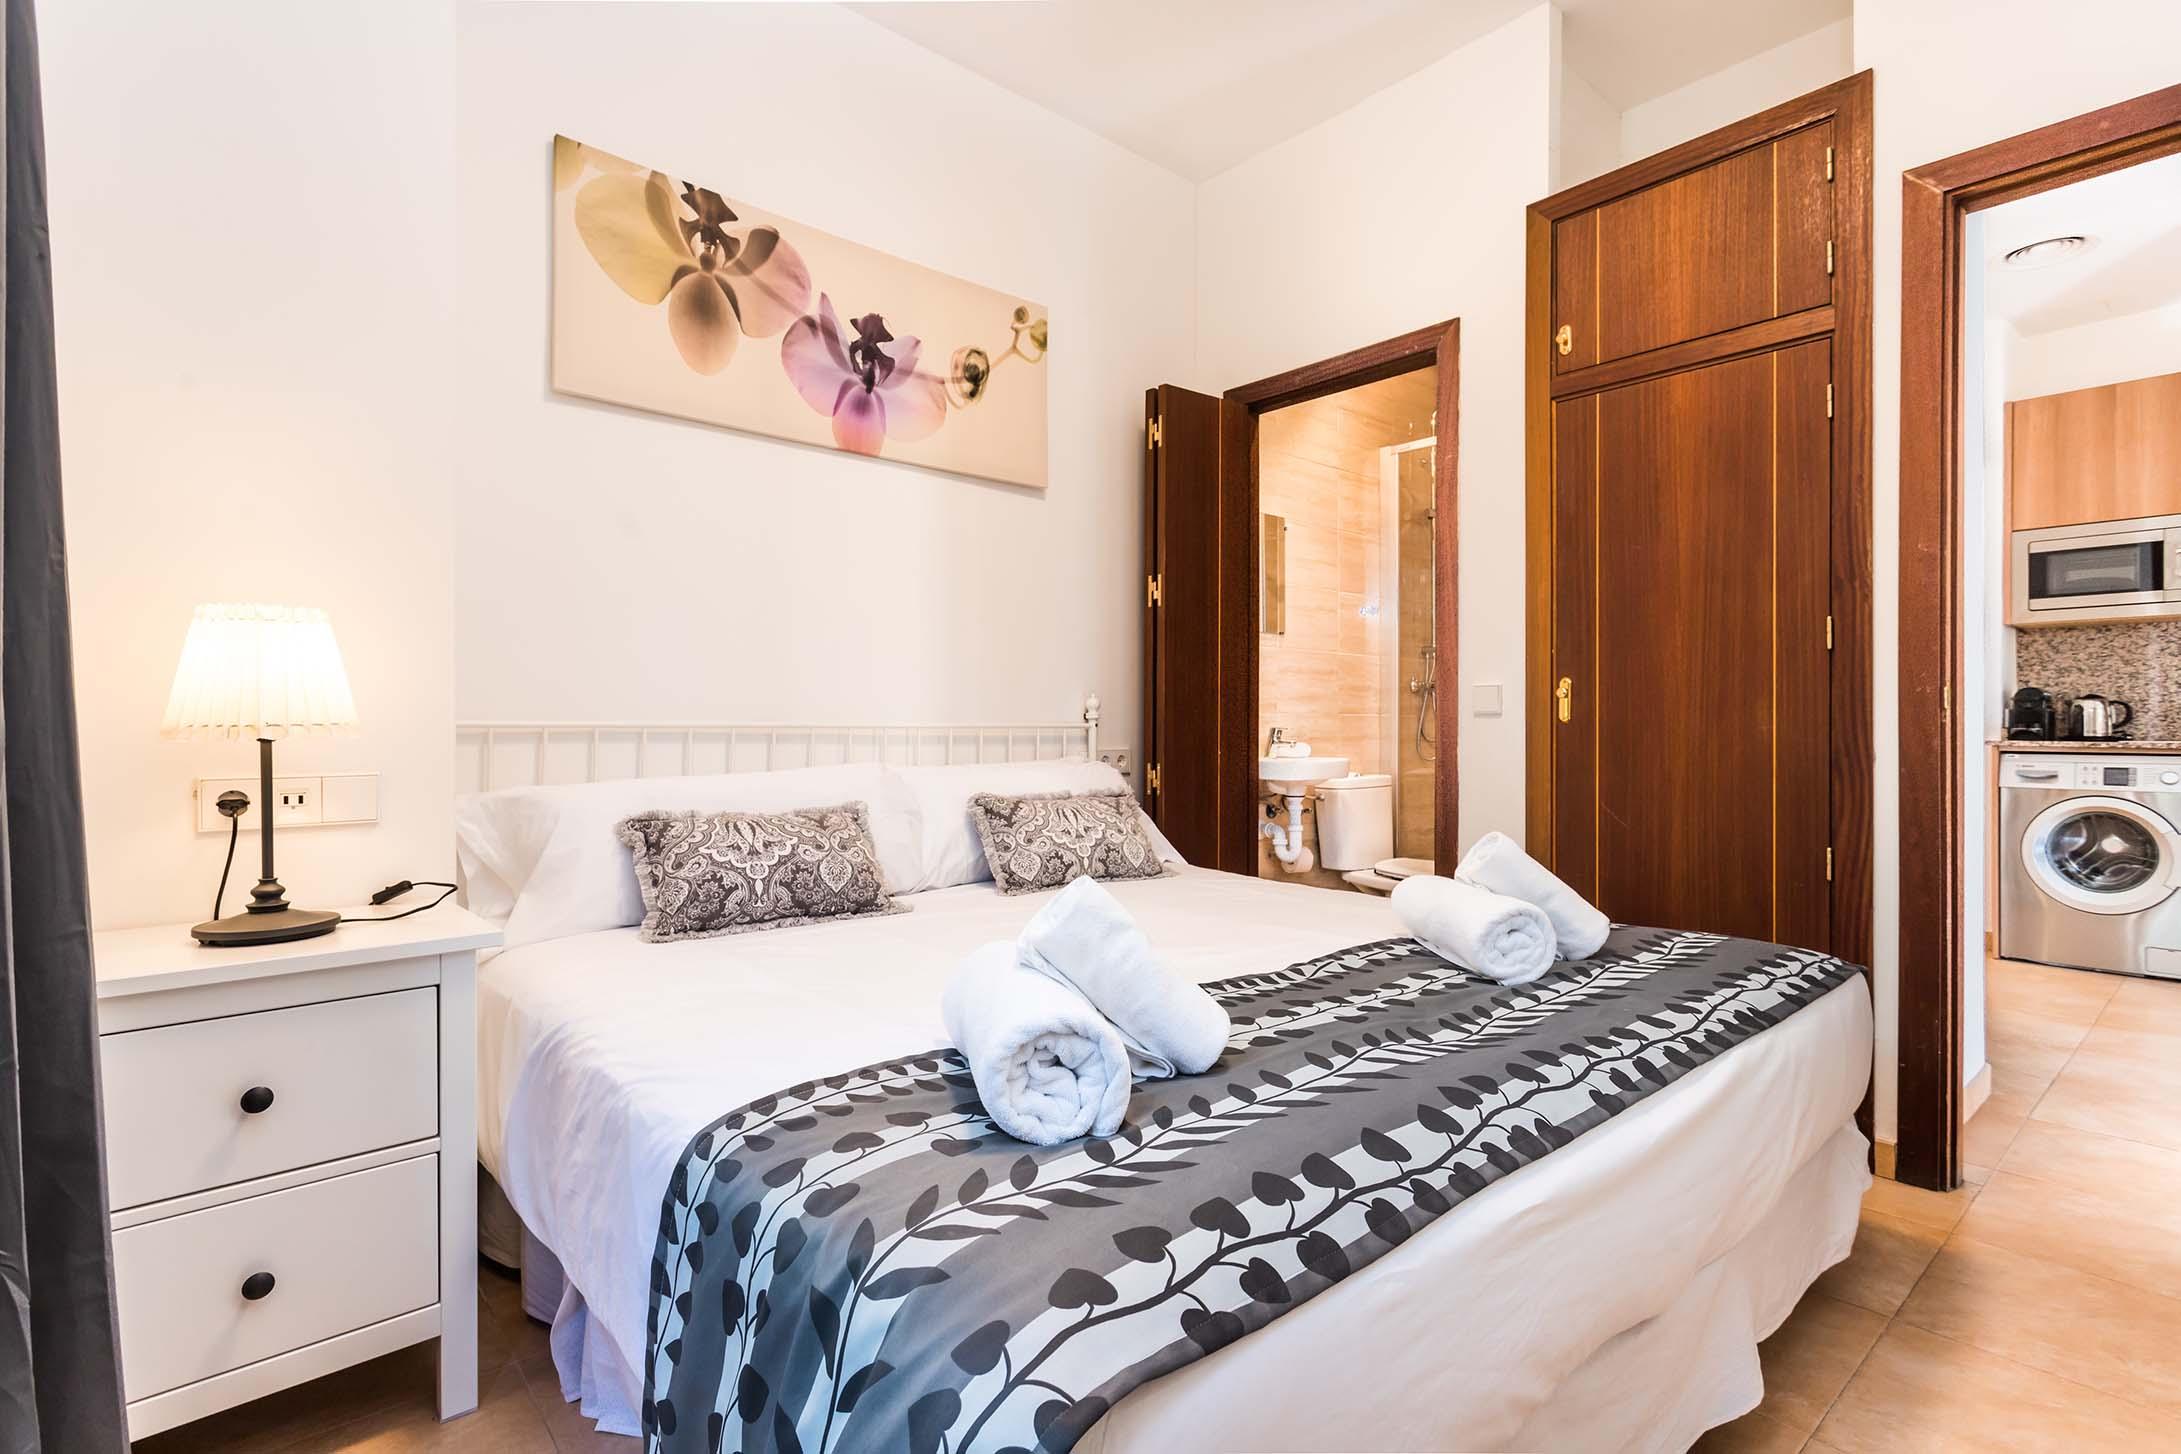 Borne-Suites-Apartamento-Superior-3-Pax-Palma-de-Mallorca-Habitación-1-1